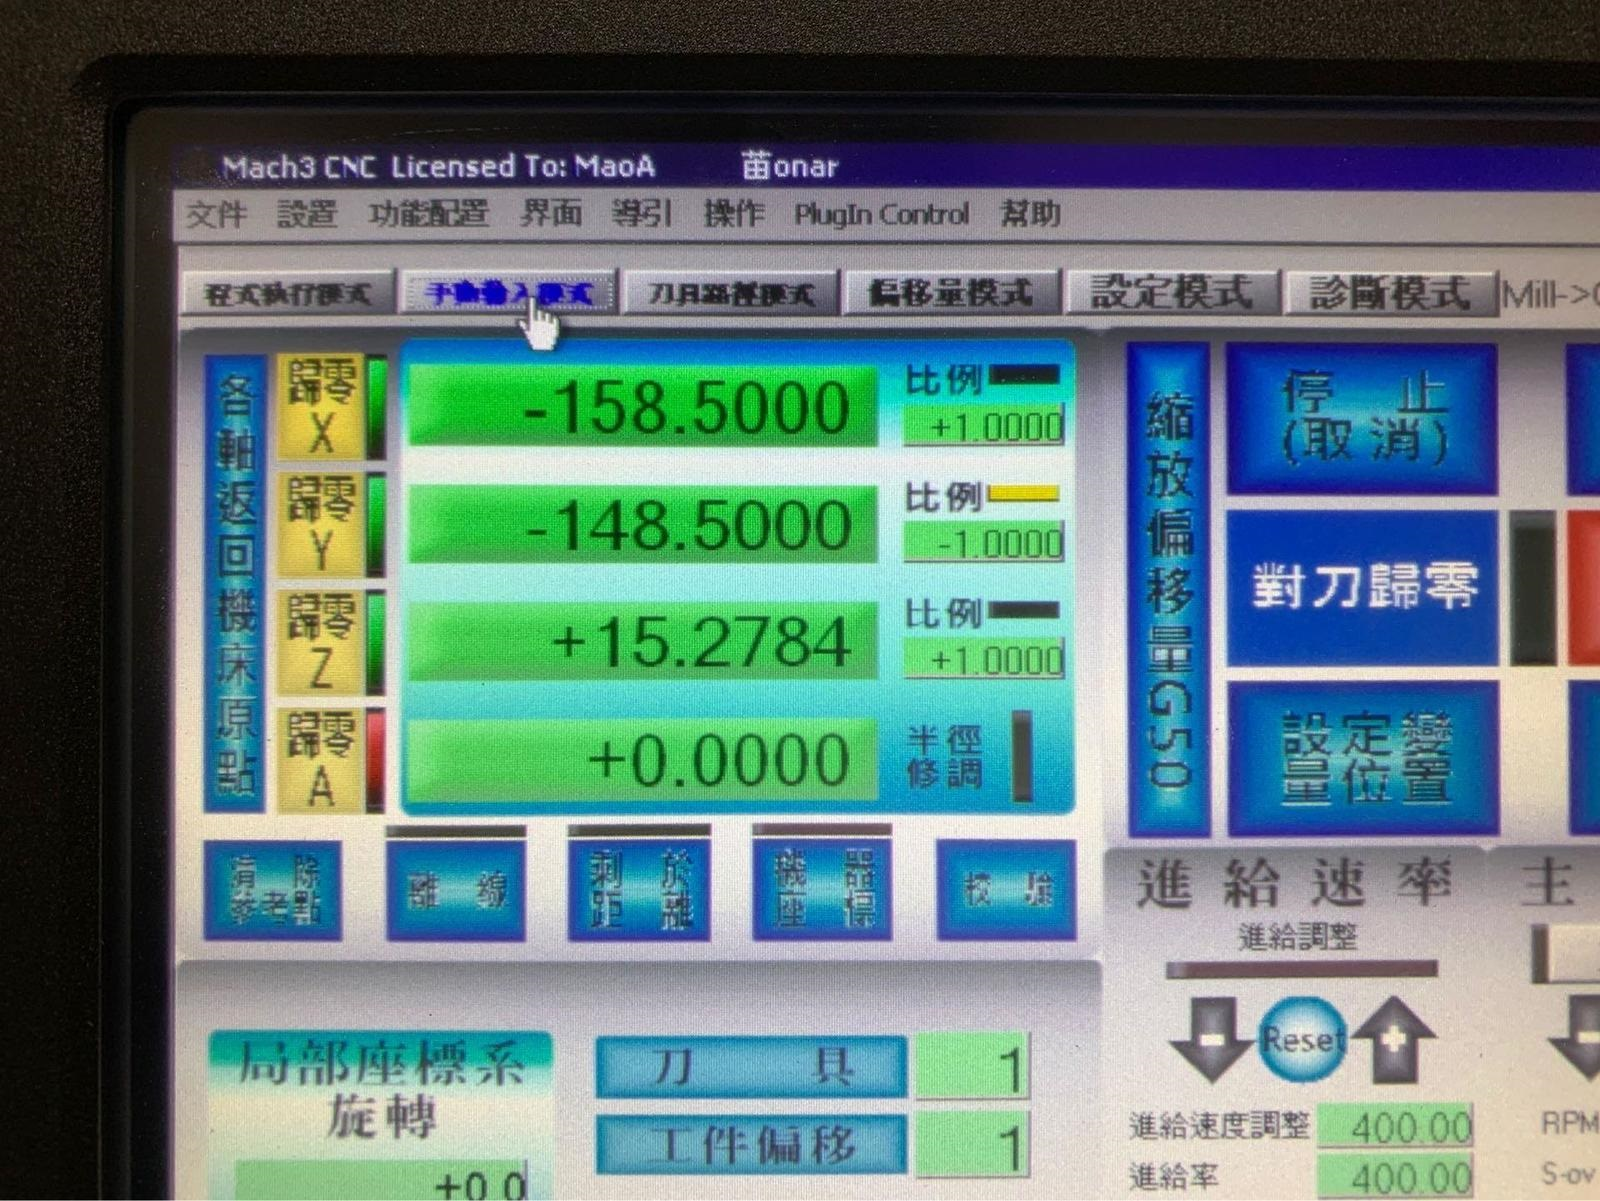 Mach 3 Z axis setting - ratio